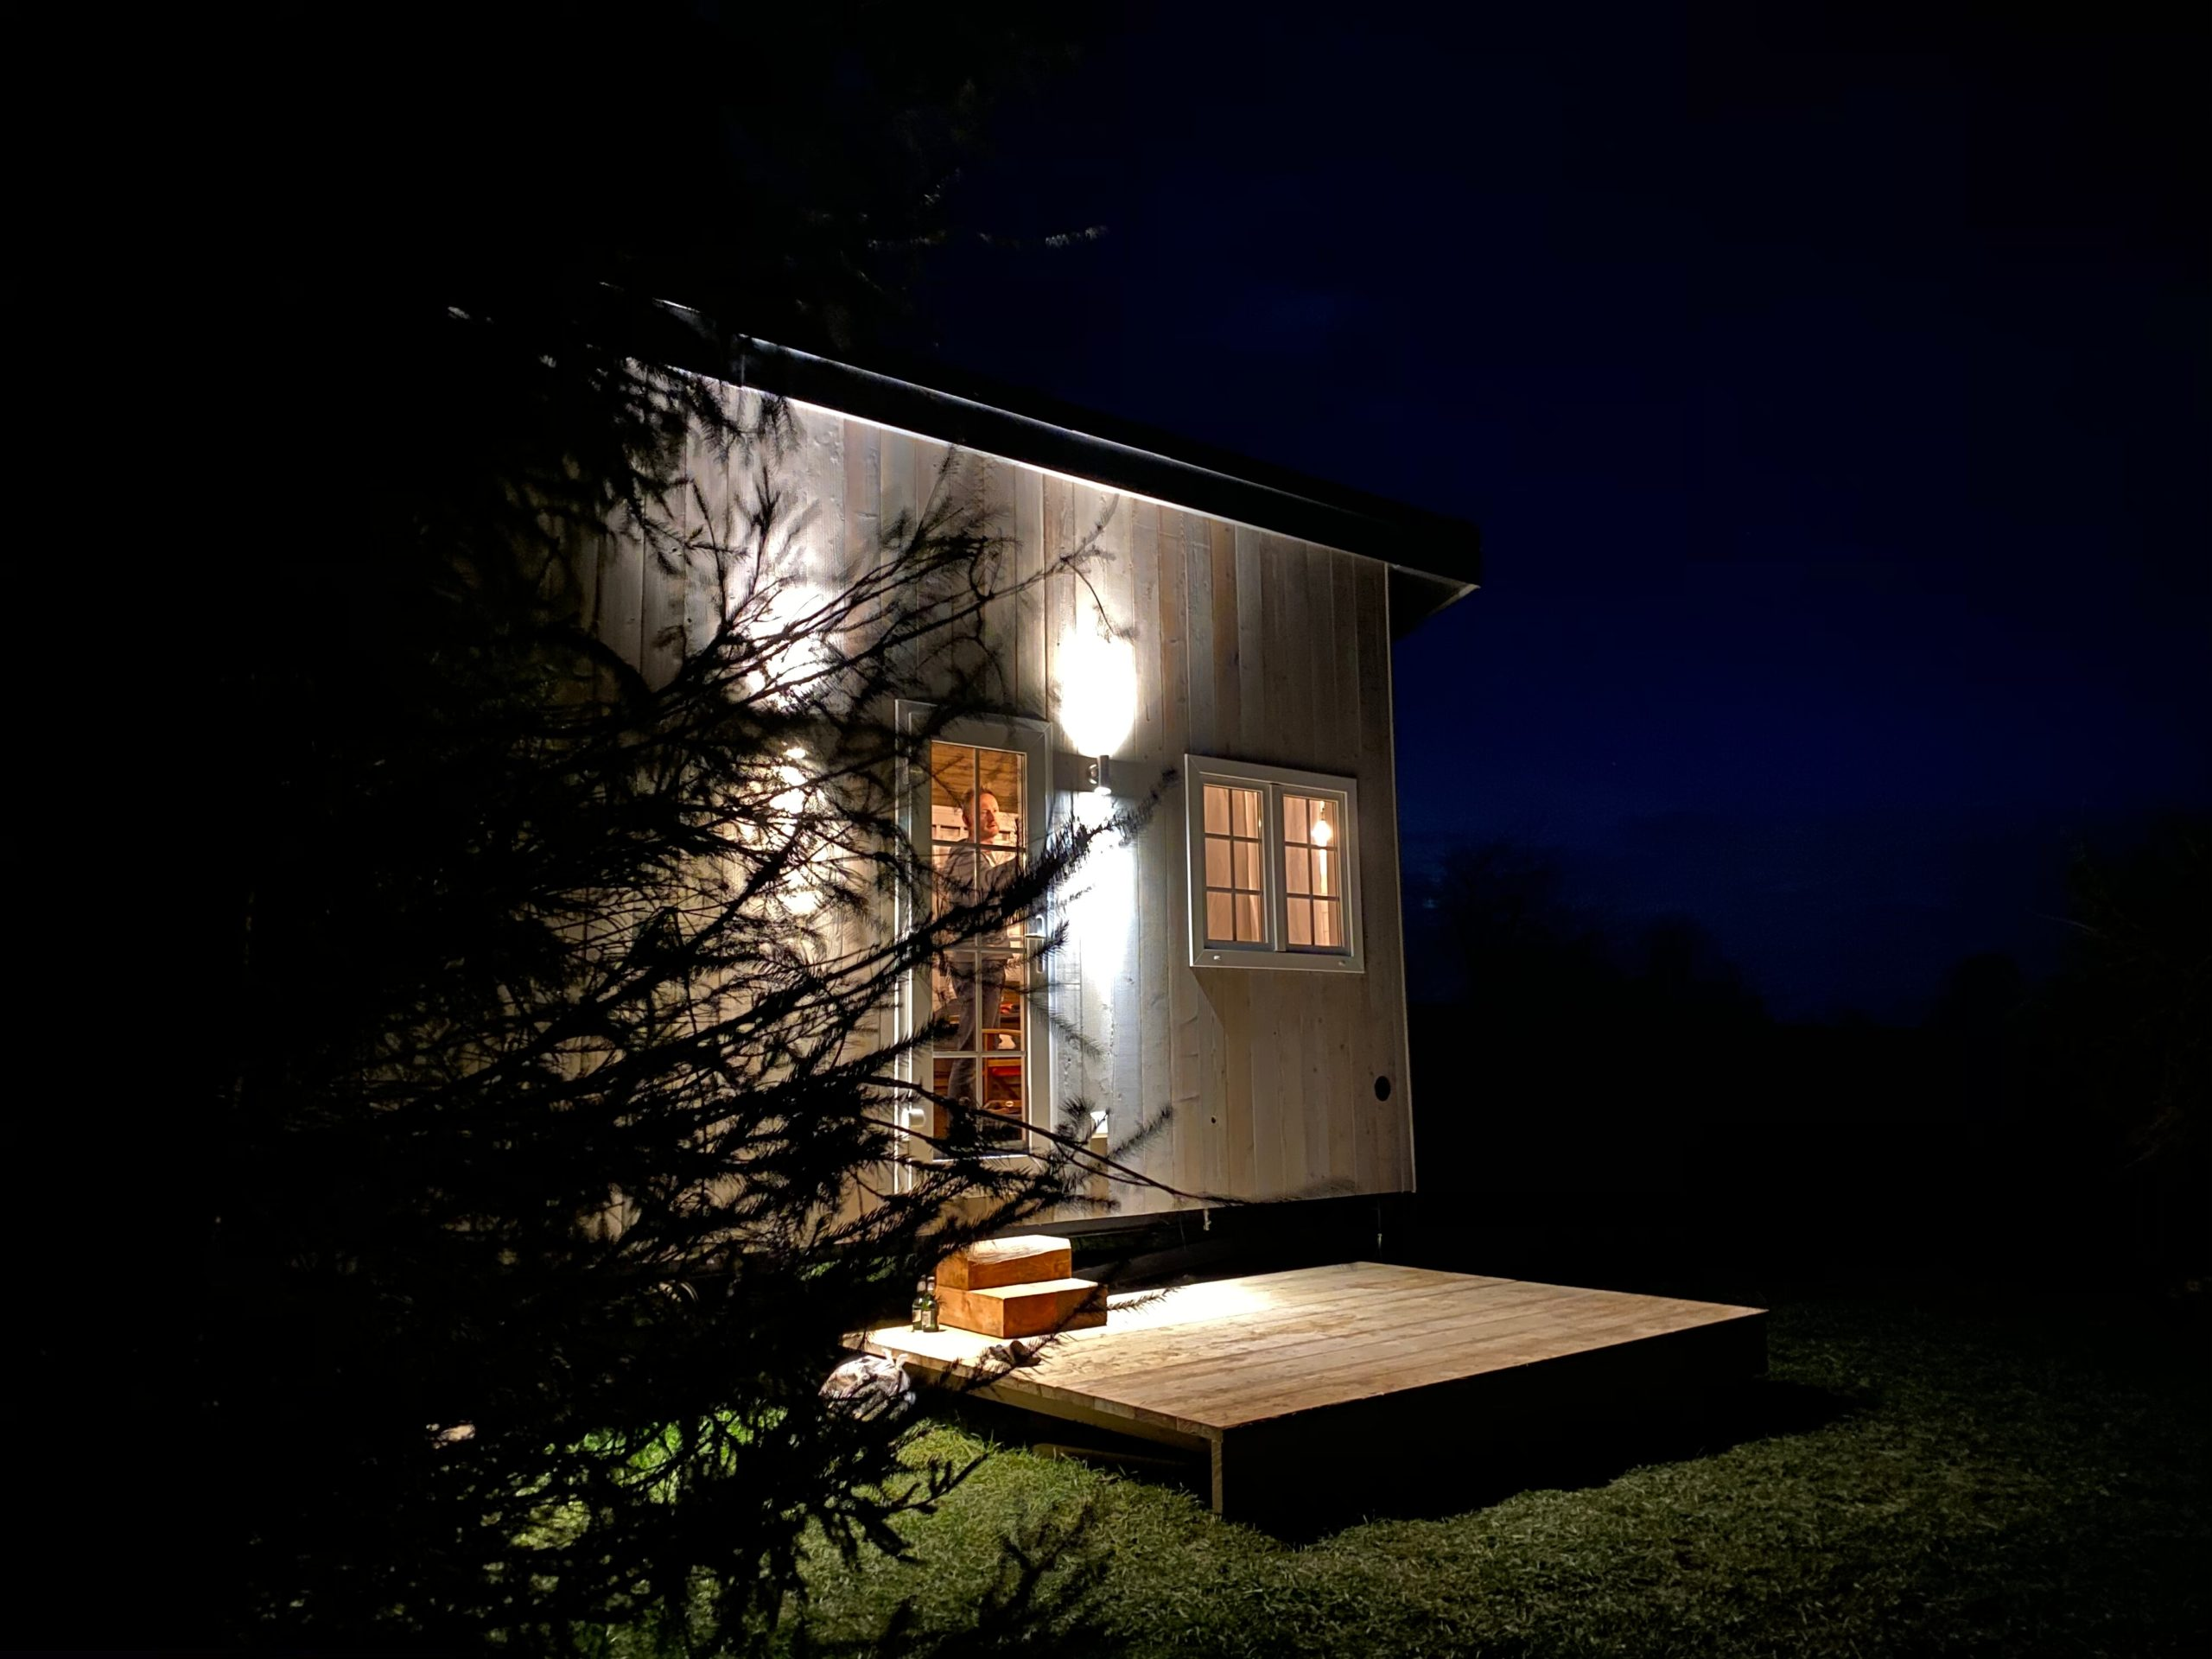 mobiles-tiny-house-lappland-vital-camp-gmbh-04